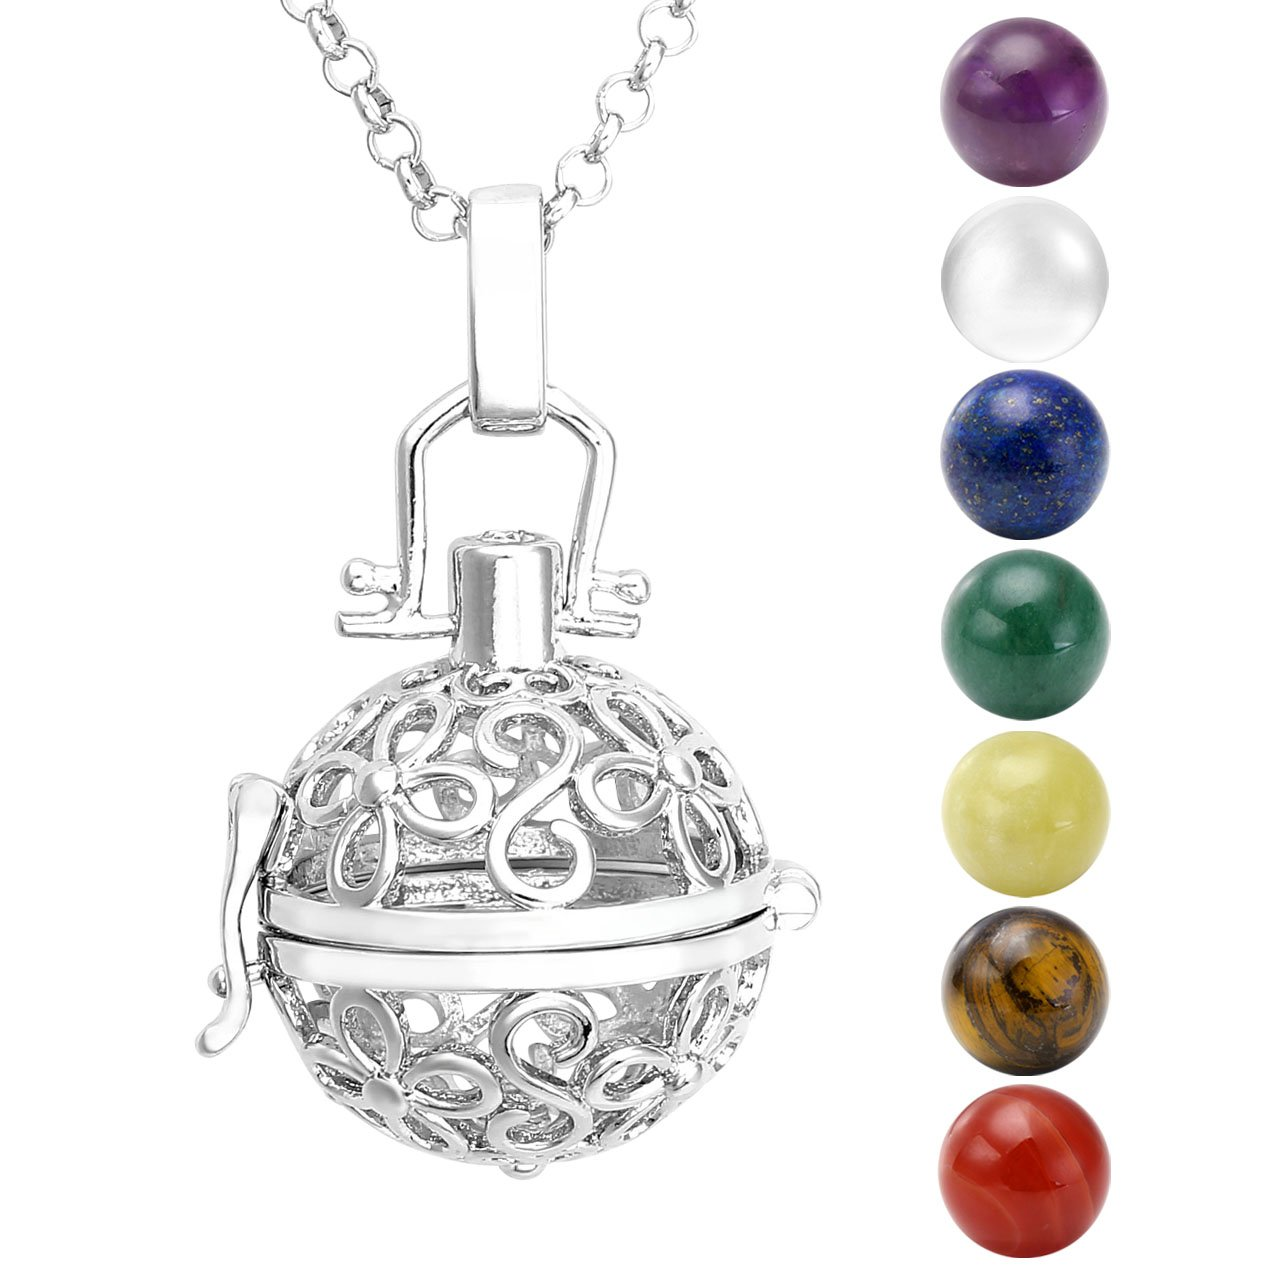 Healing crystal necklace amazon jsdde hollow flower locket pendant 7 chakra natural beads healing crystal gemstones necklace aloadofball Choice Image